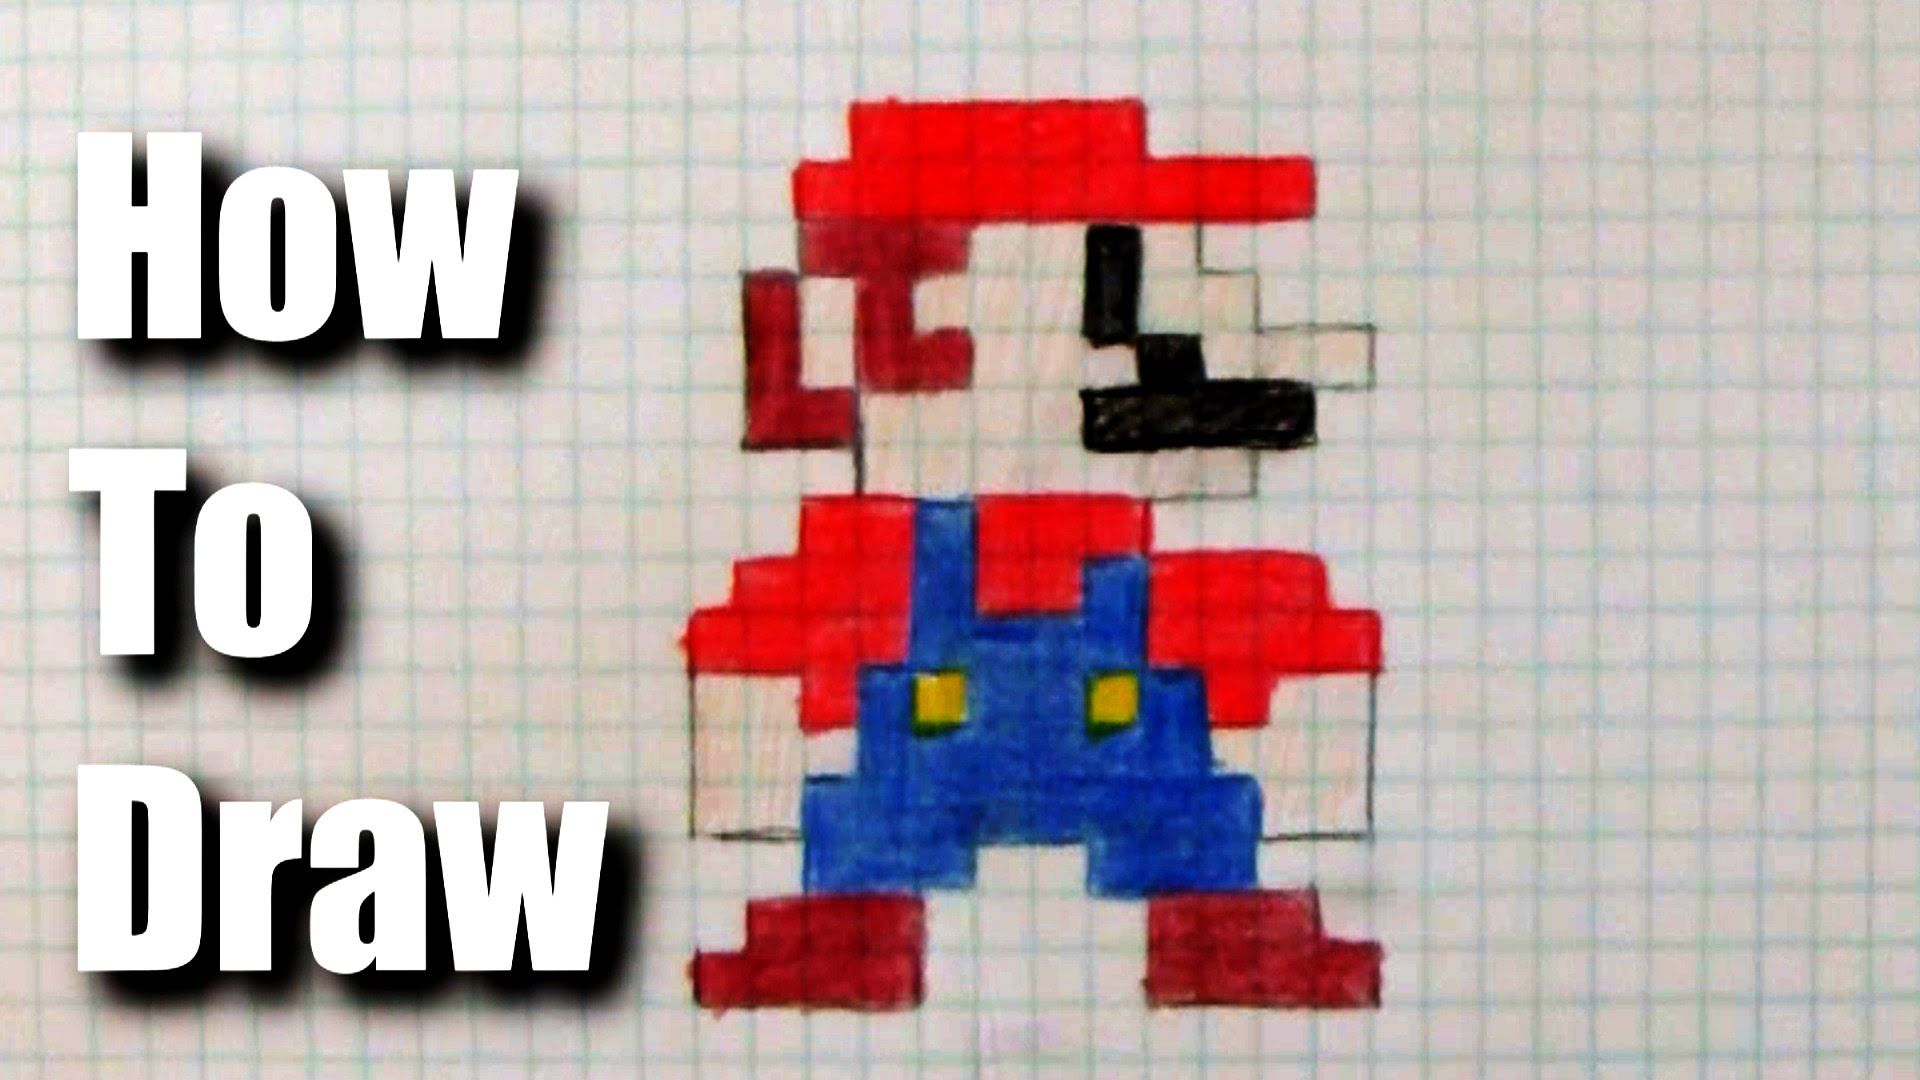 How to draw 8-bit Mario | 8-bit drawing | Pinterest